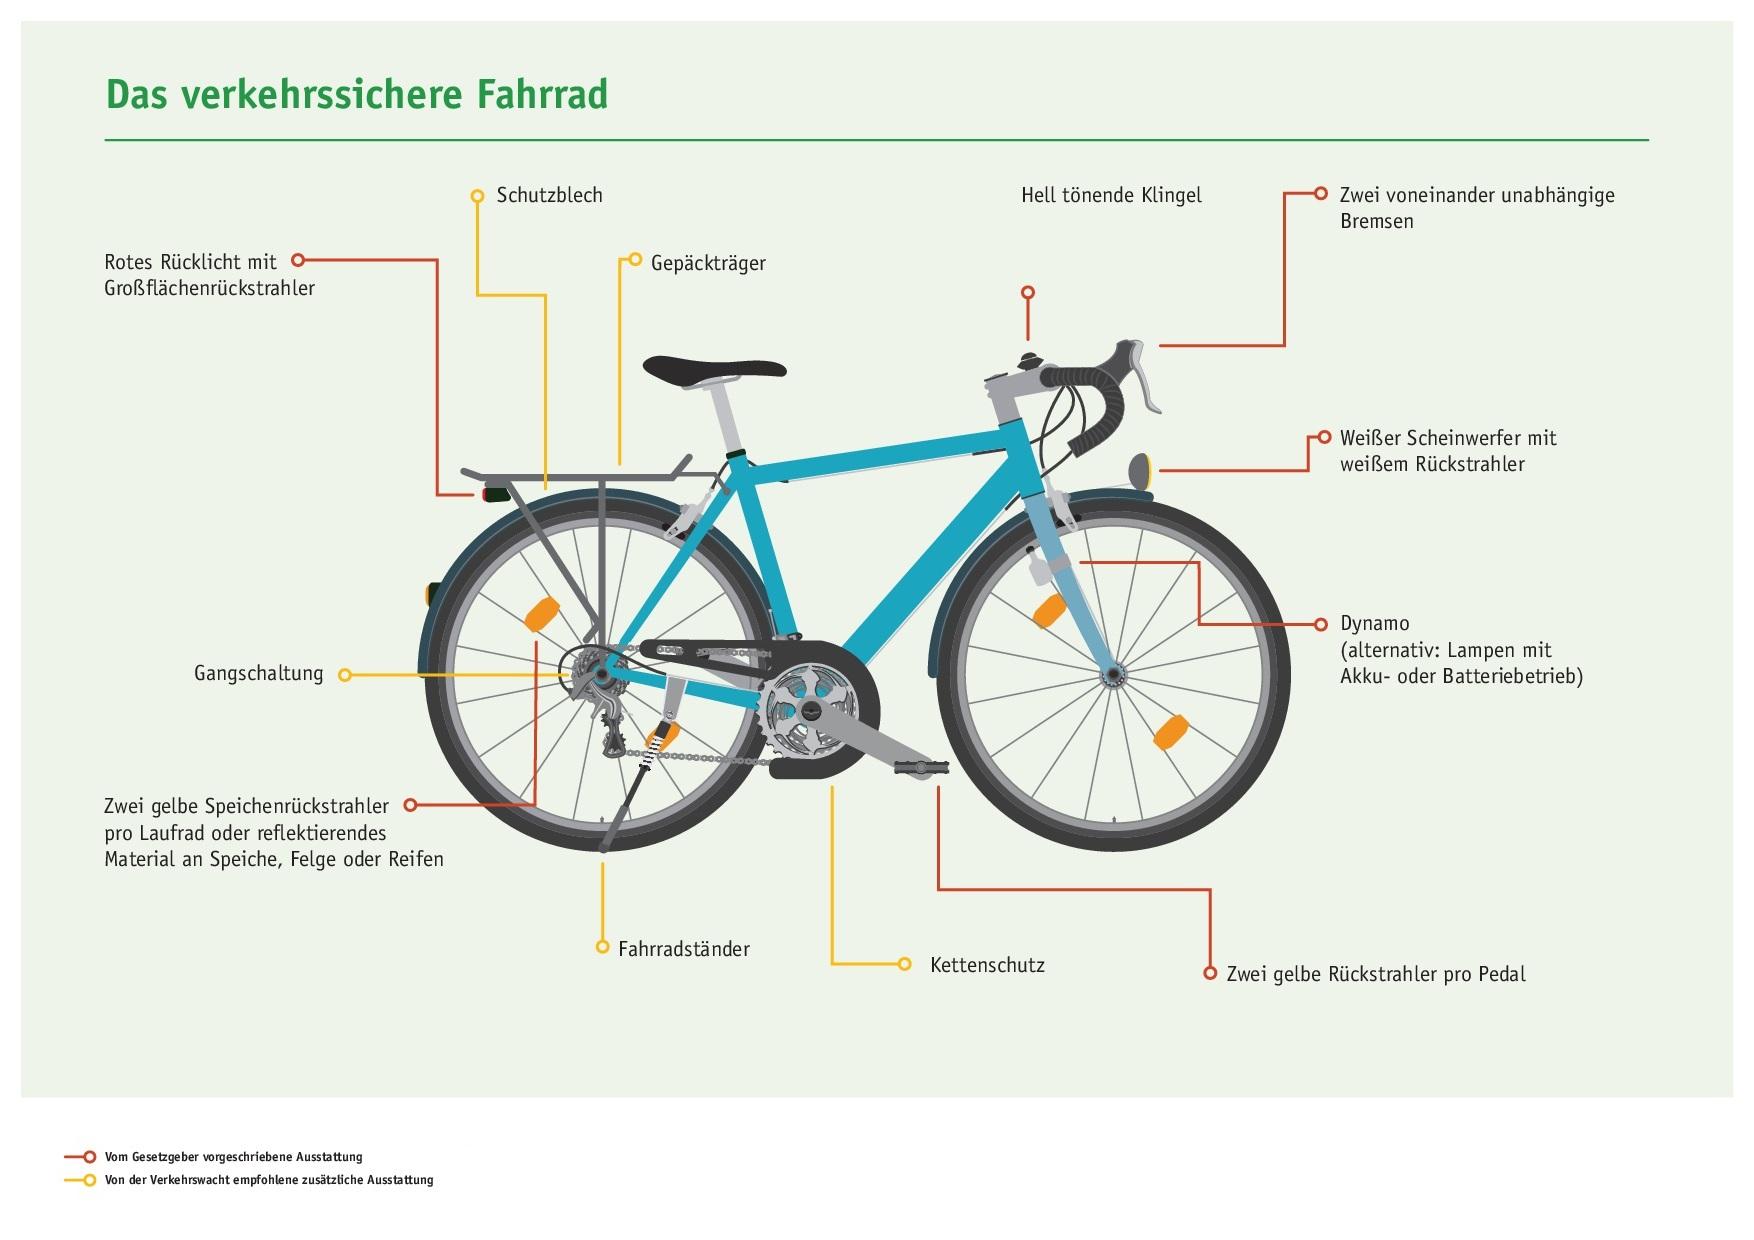 DVW_Plakat_Verkehrssicheres_Fahrrad vorläufig